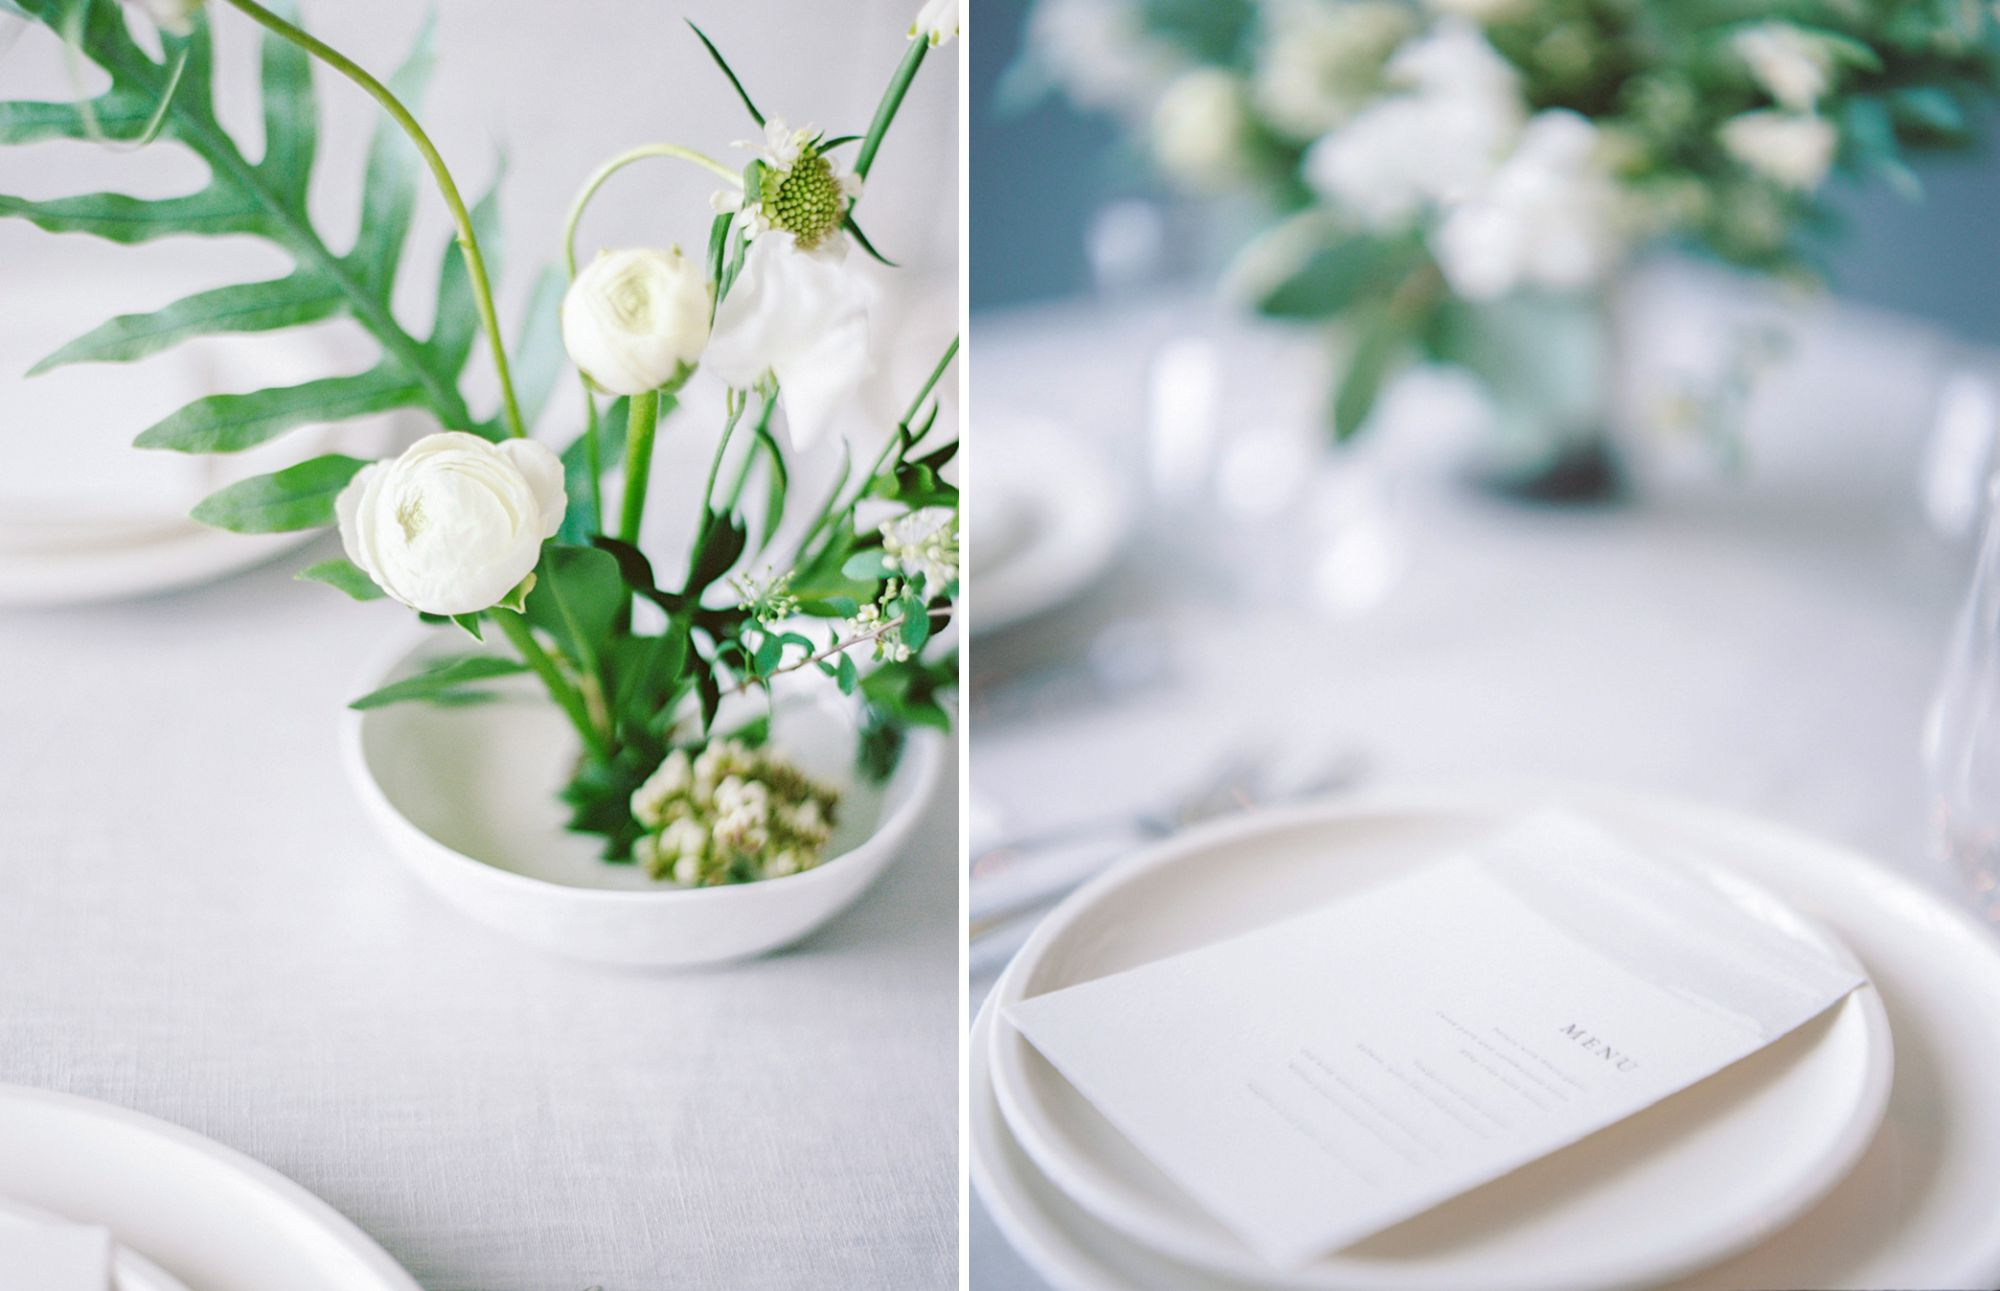 katja-scherle-festtagsfotografien_berlin-hamburg-filmweddingphotographer-hochzeitsfotograf-analog-minimalistic-wedding_0036